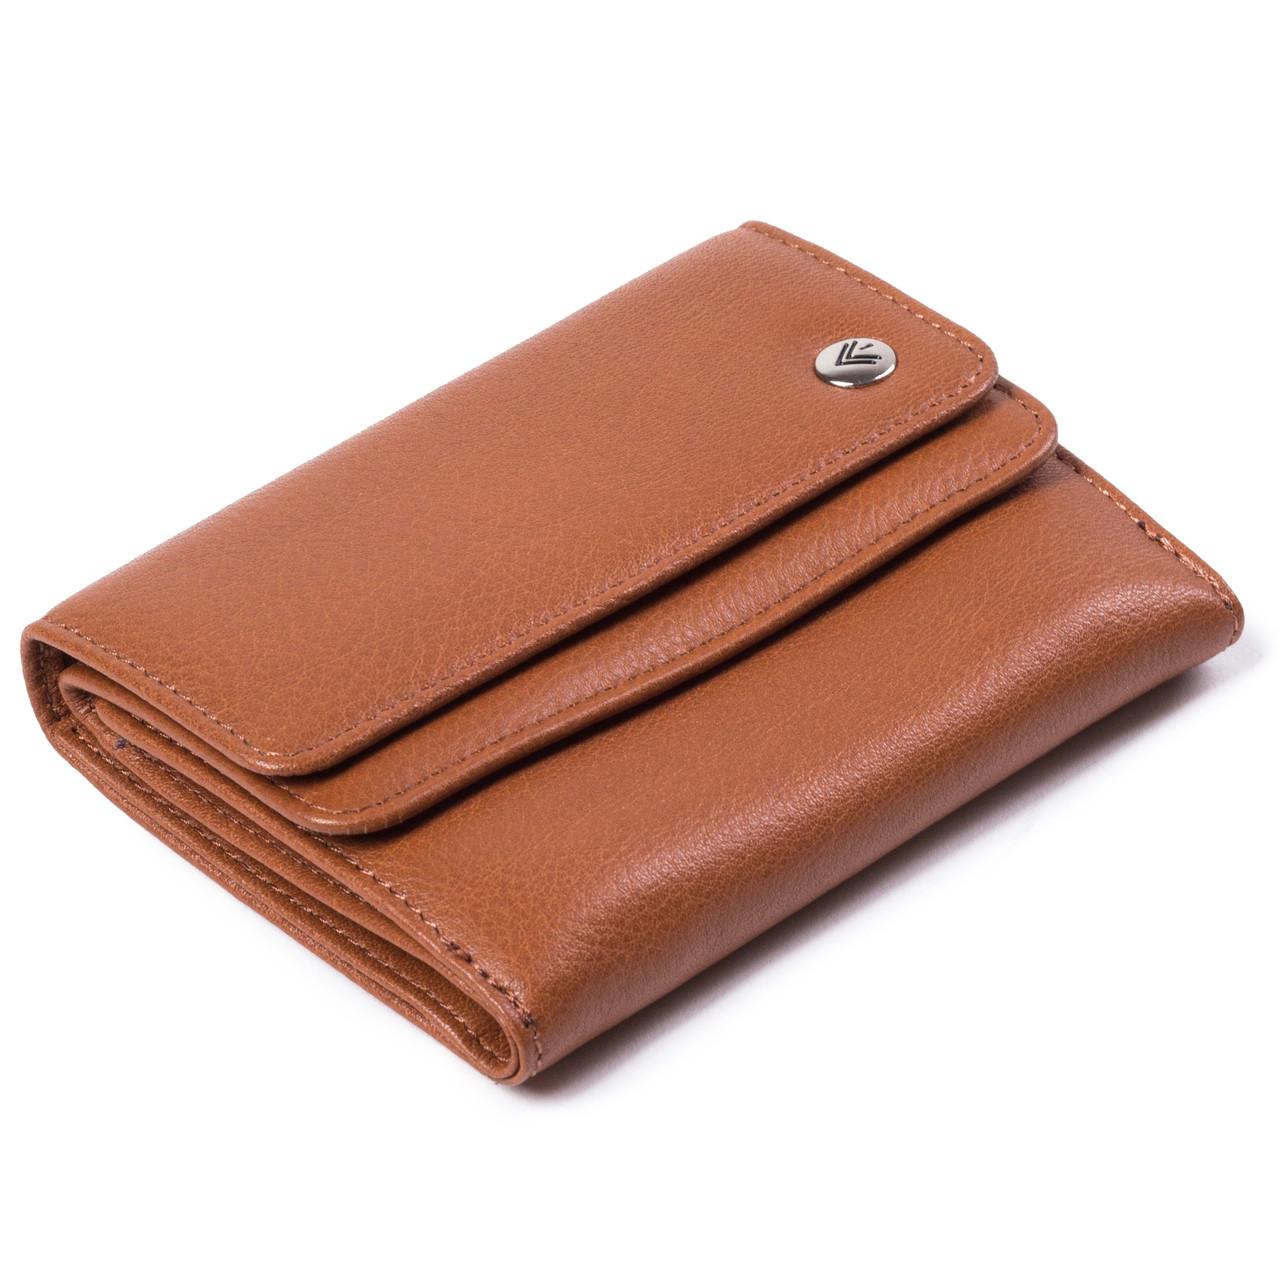 Женский кошелек кожаный коричневый Eminsa 2056-12-2